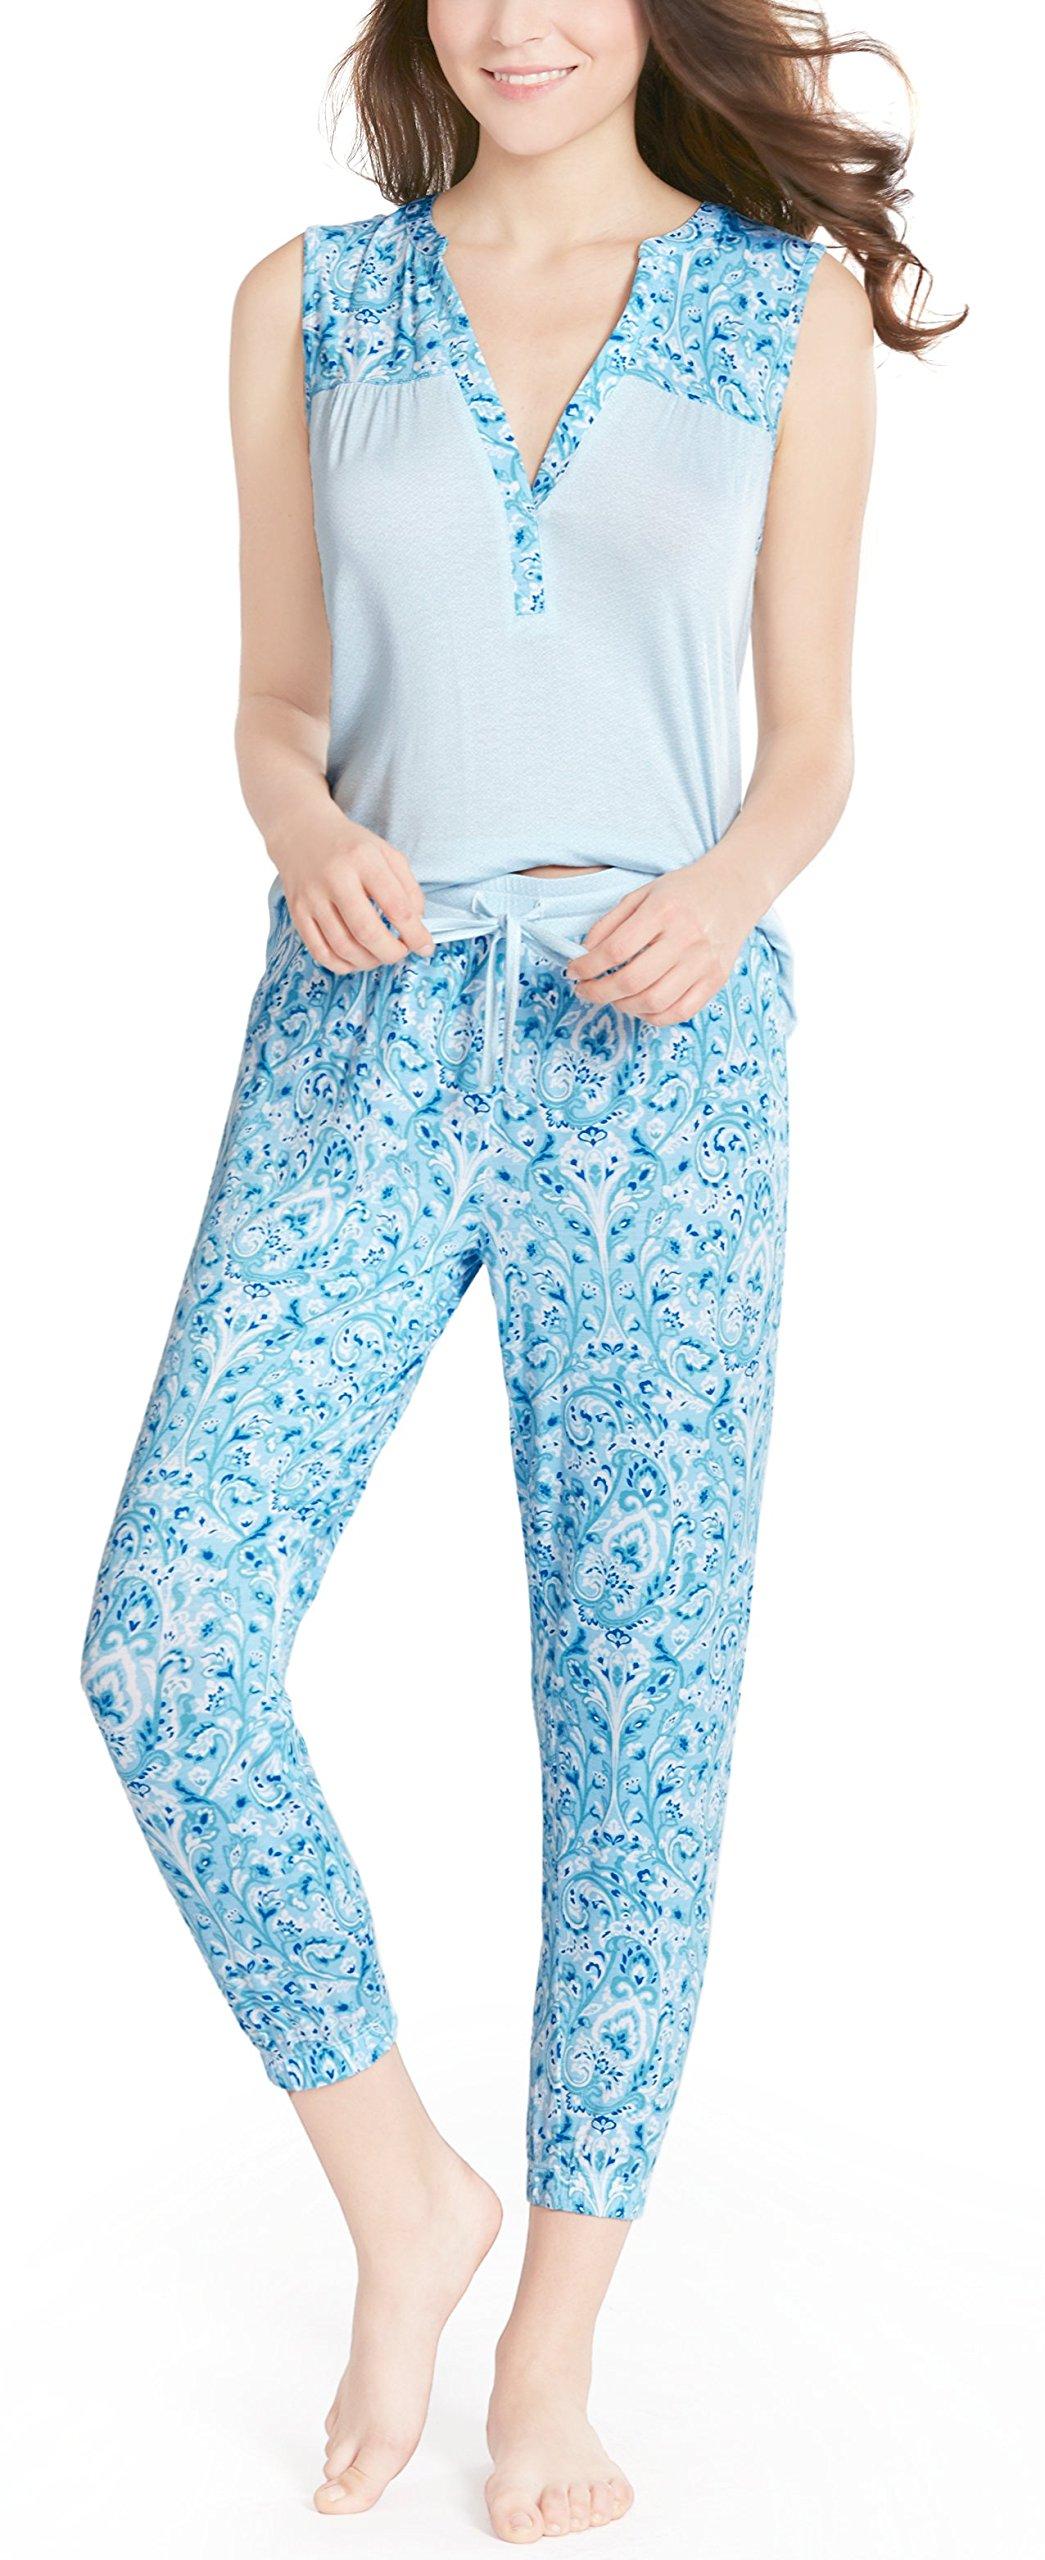 Summer Pajamas Women, Stylish Print Ladies Pajama Set - Pjs Woman Button Sleeveless Jogger Capri Lounge Pants Sweet Paisley XL